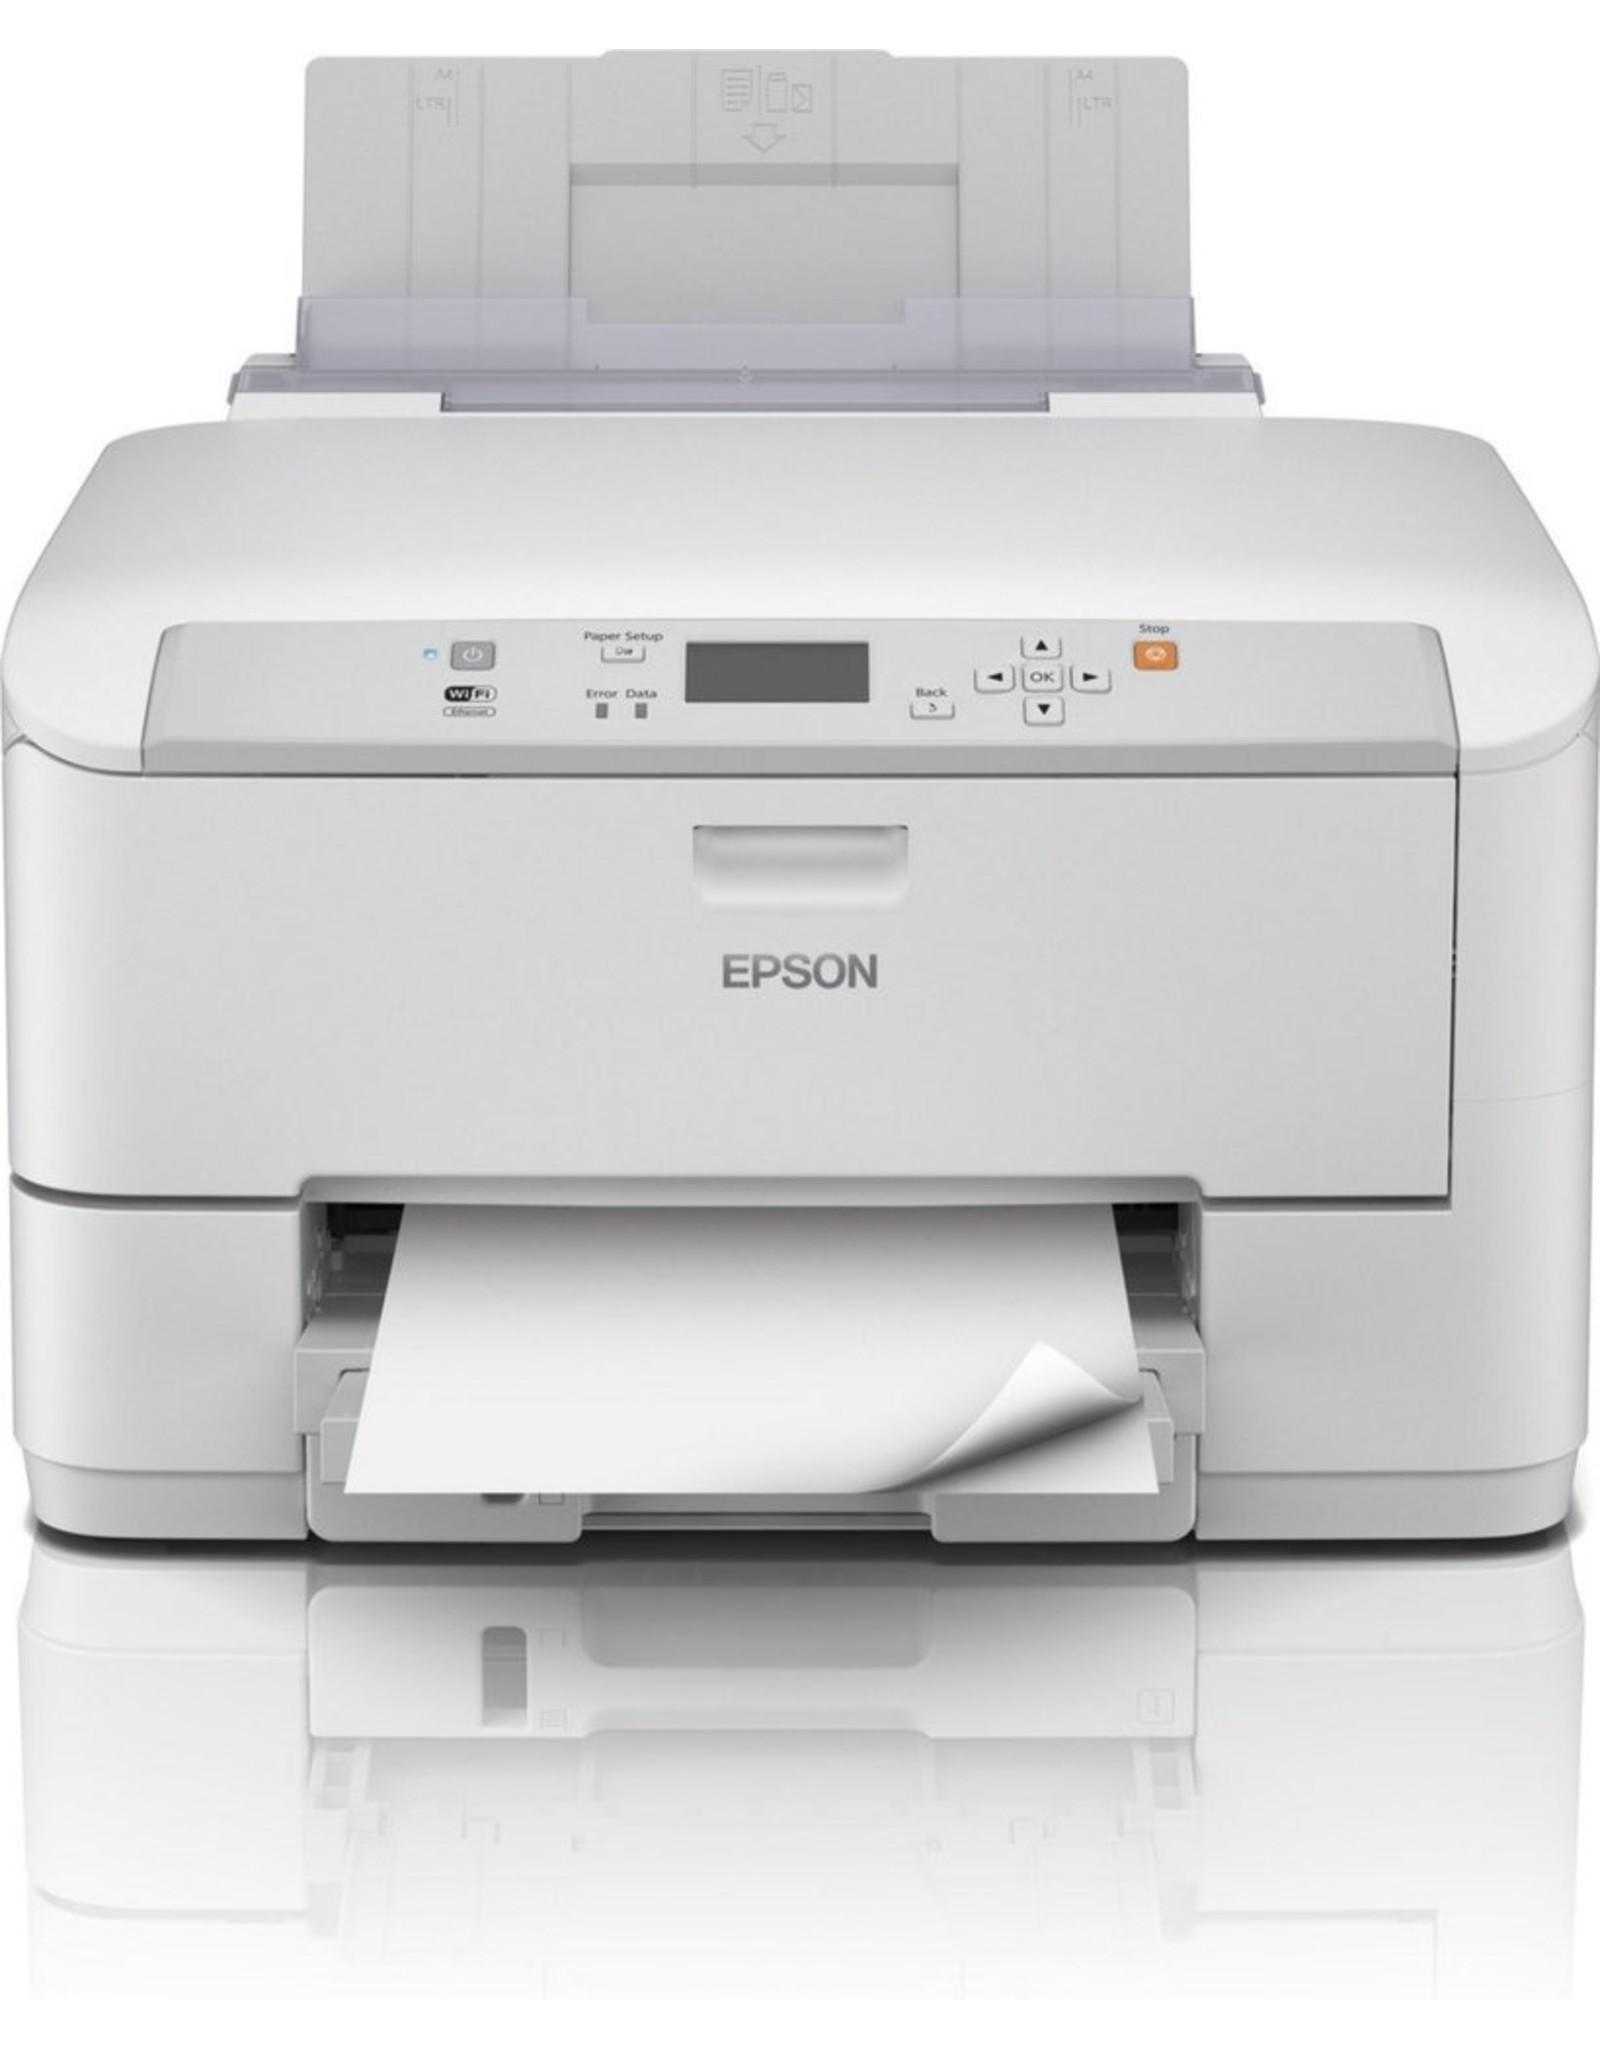 Epson WorkForce Pro WF-M5190DW / WiFi / Black